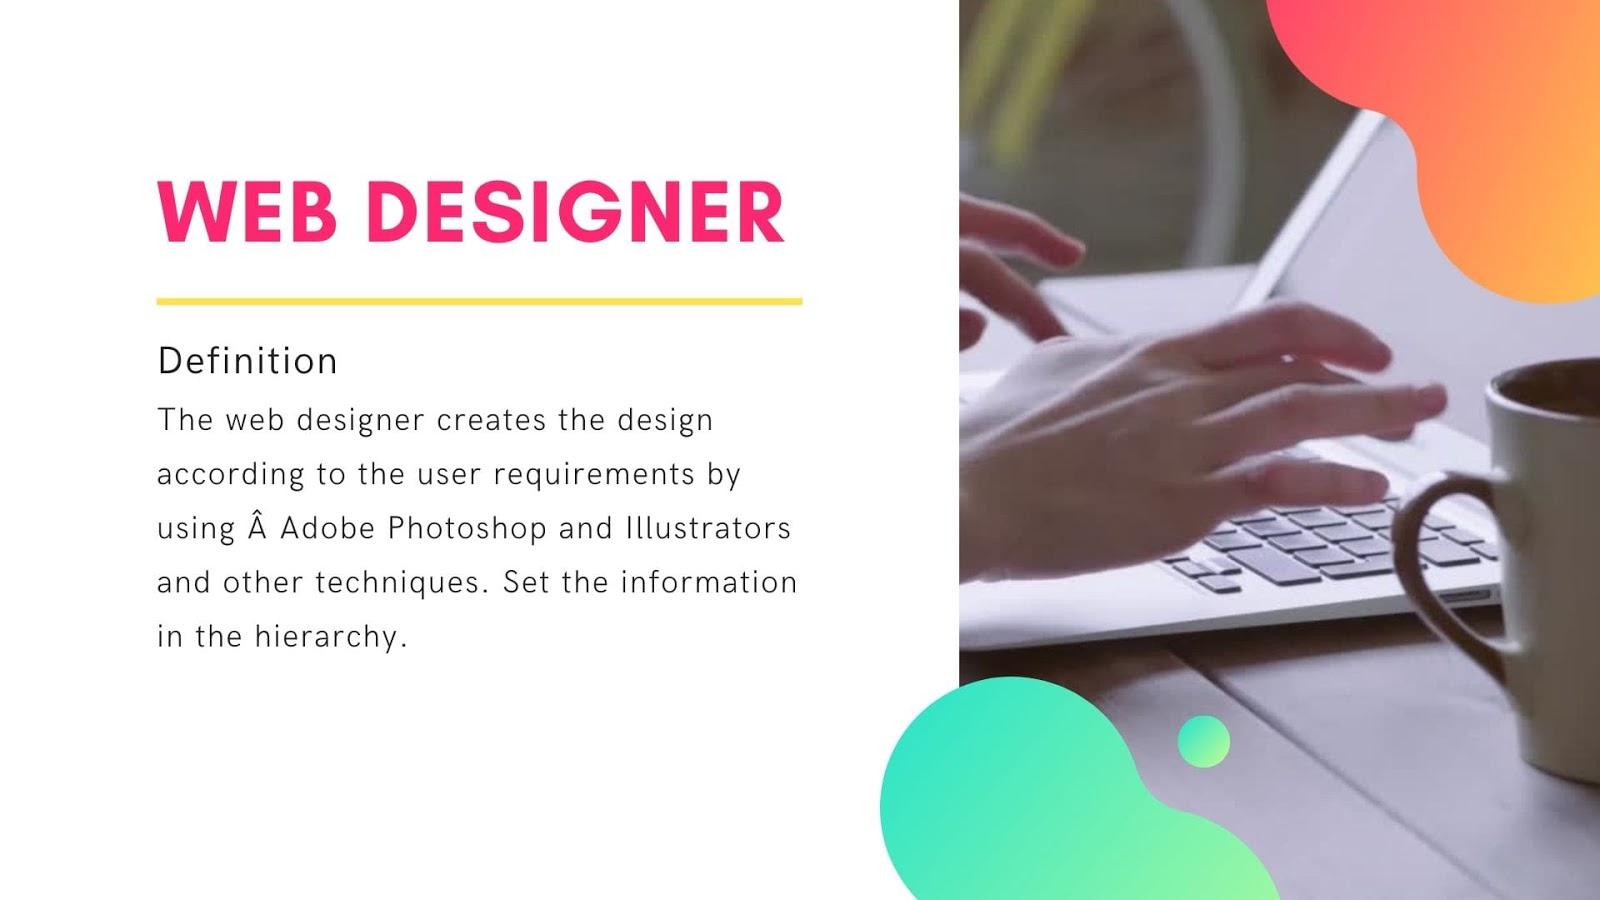 What is Web Designer